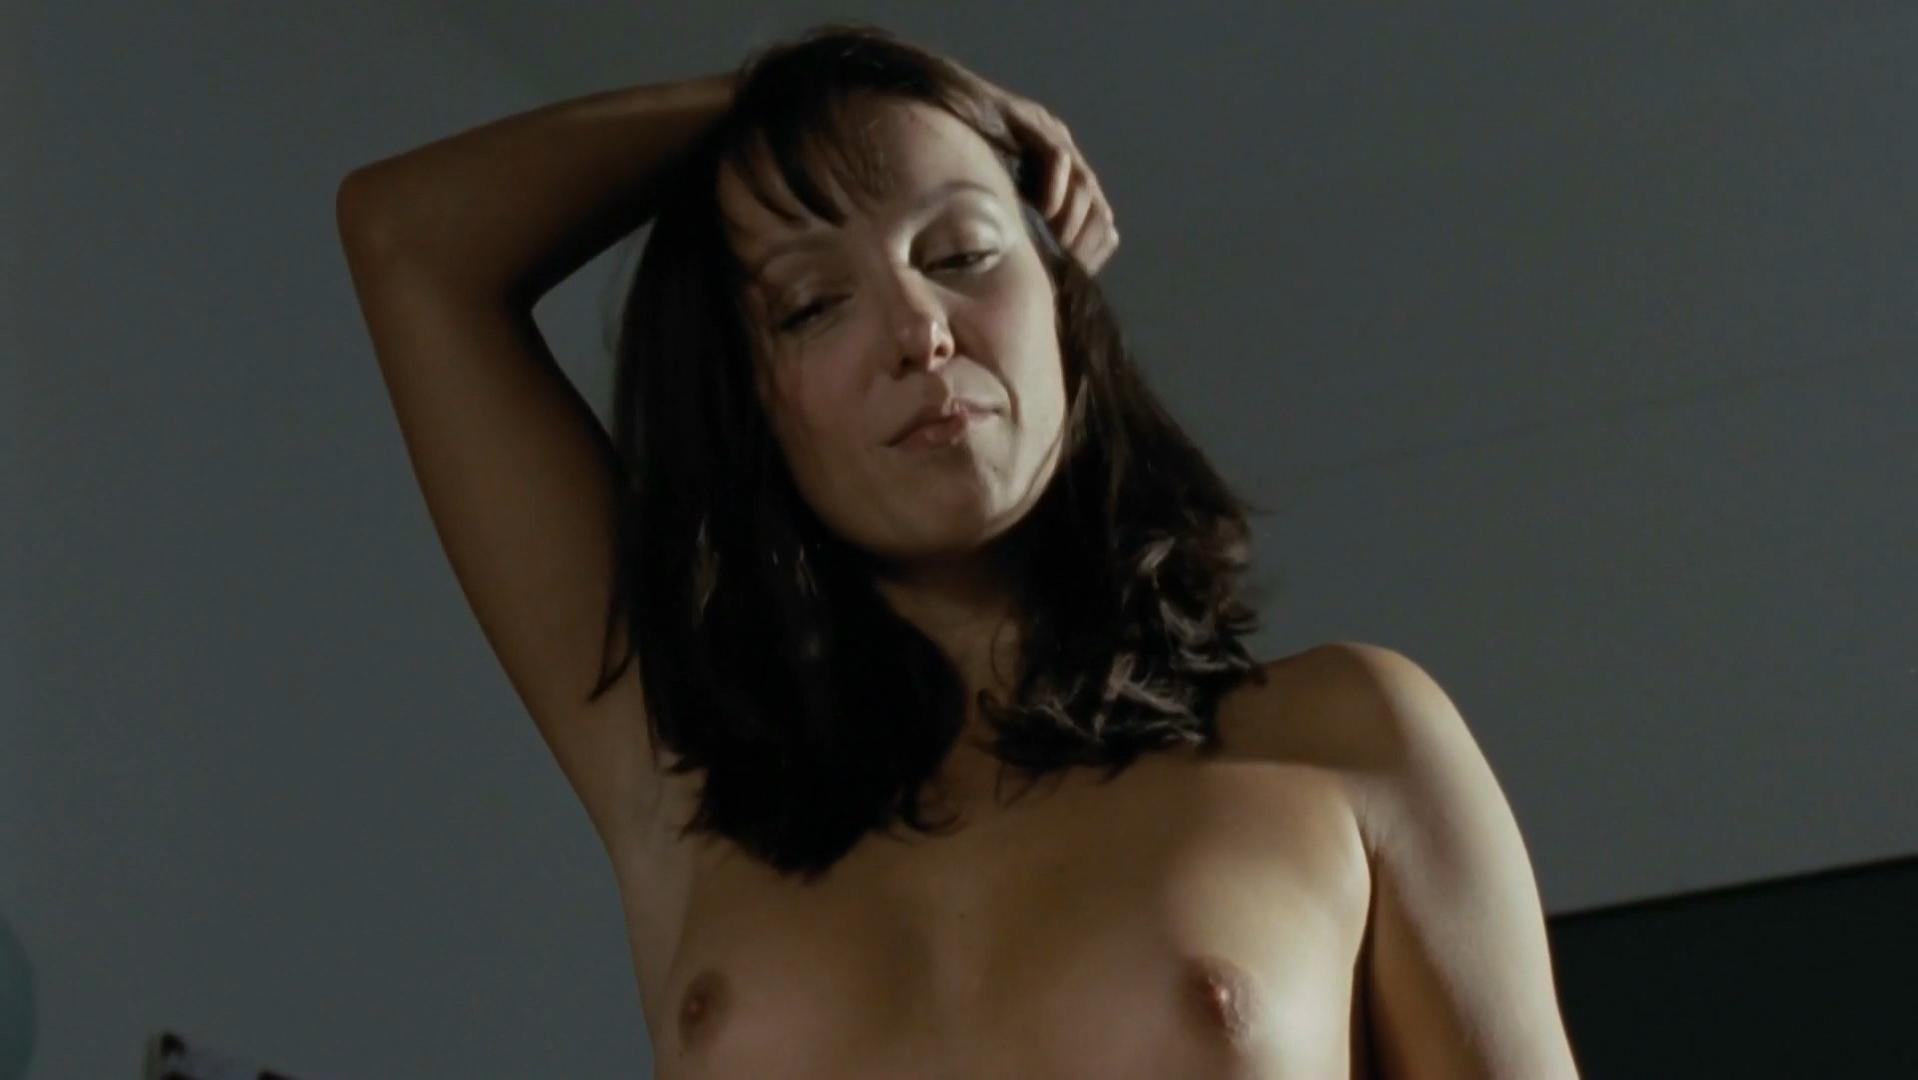 Nude Video Celebs Actress Julia Koschitz